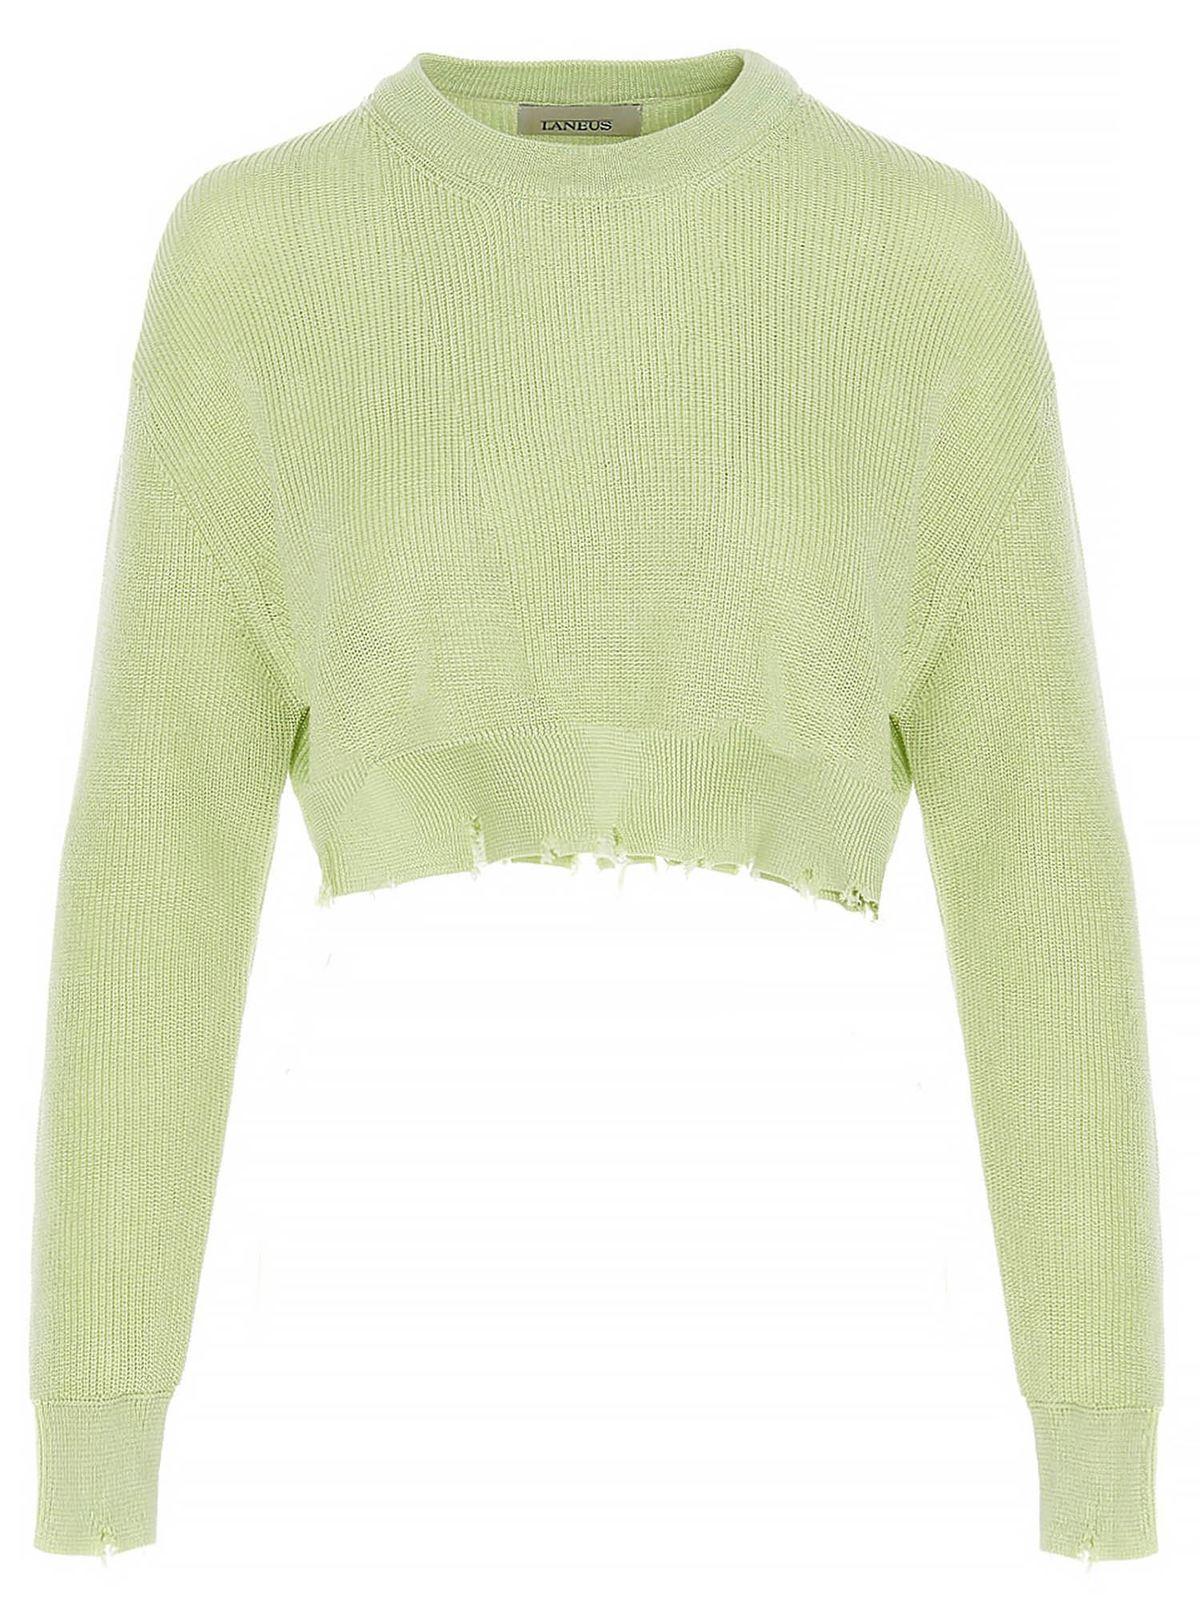 Laneus Cottons DESTROYED HEM CROP SWEATER IN GREEN